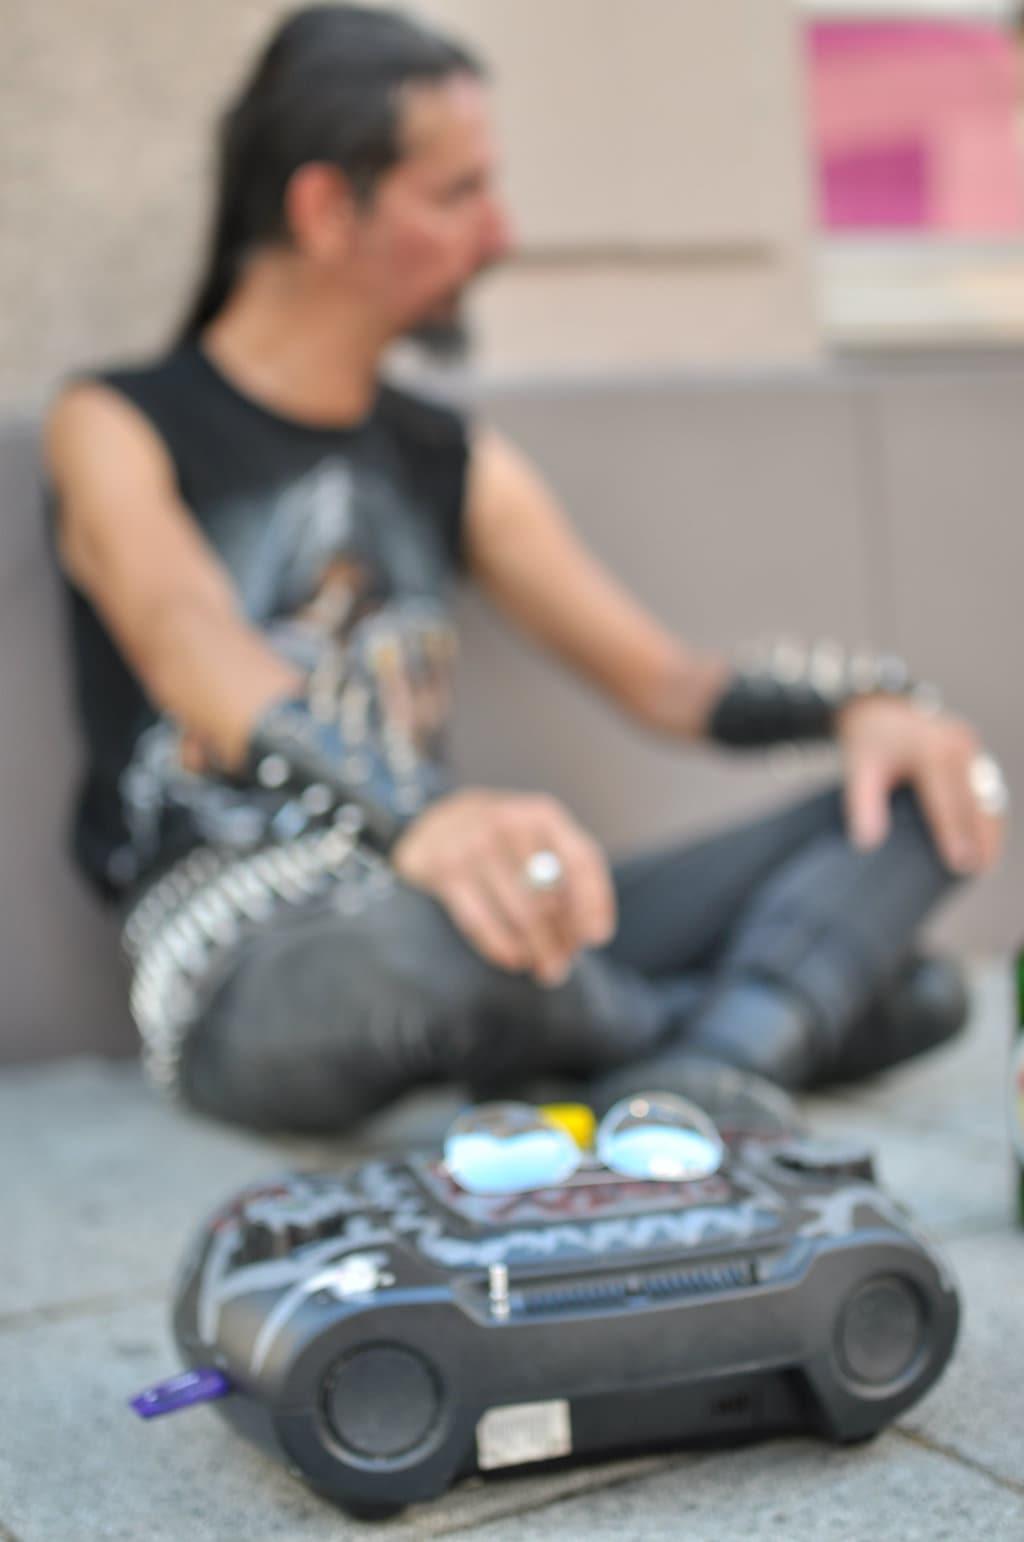 http://www.rue89strasbourg.com/wp-content/uploads/2015/08/HARD-ROCK.jpg